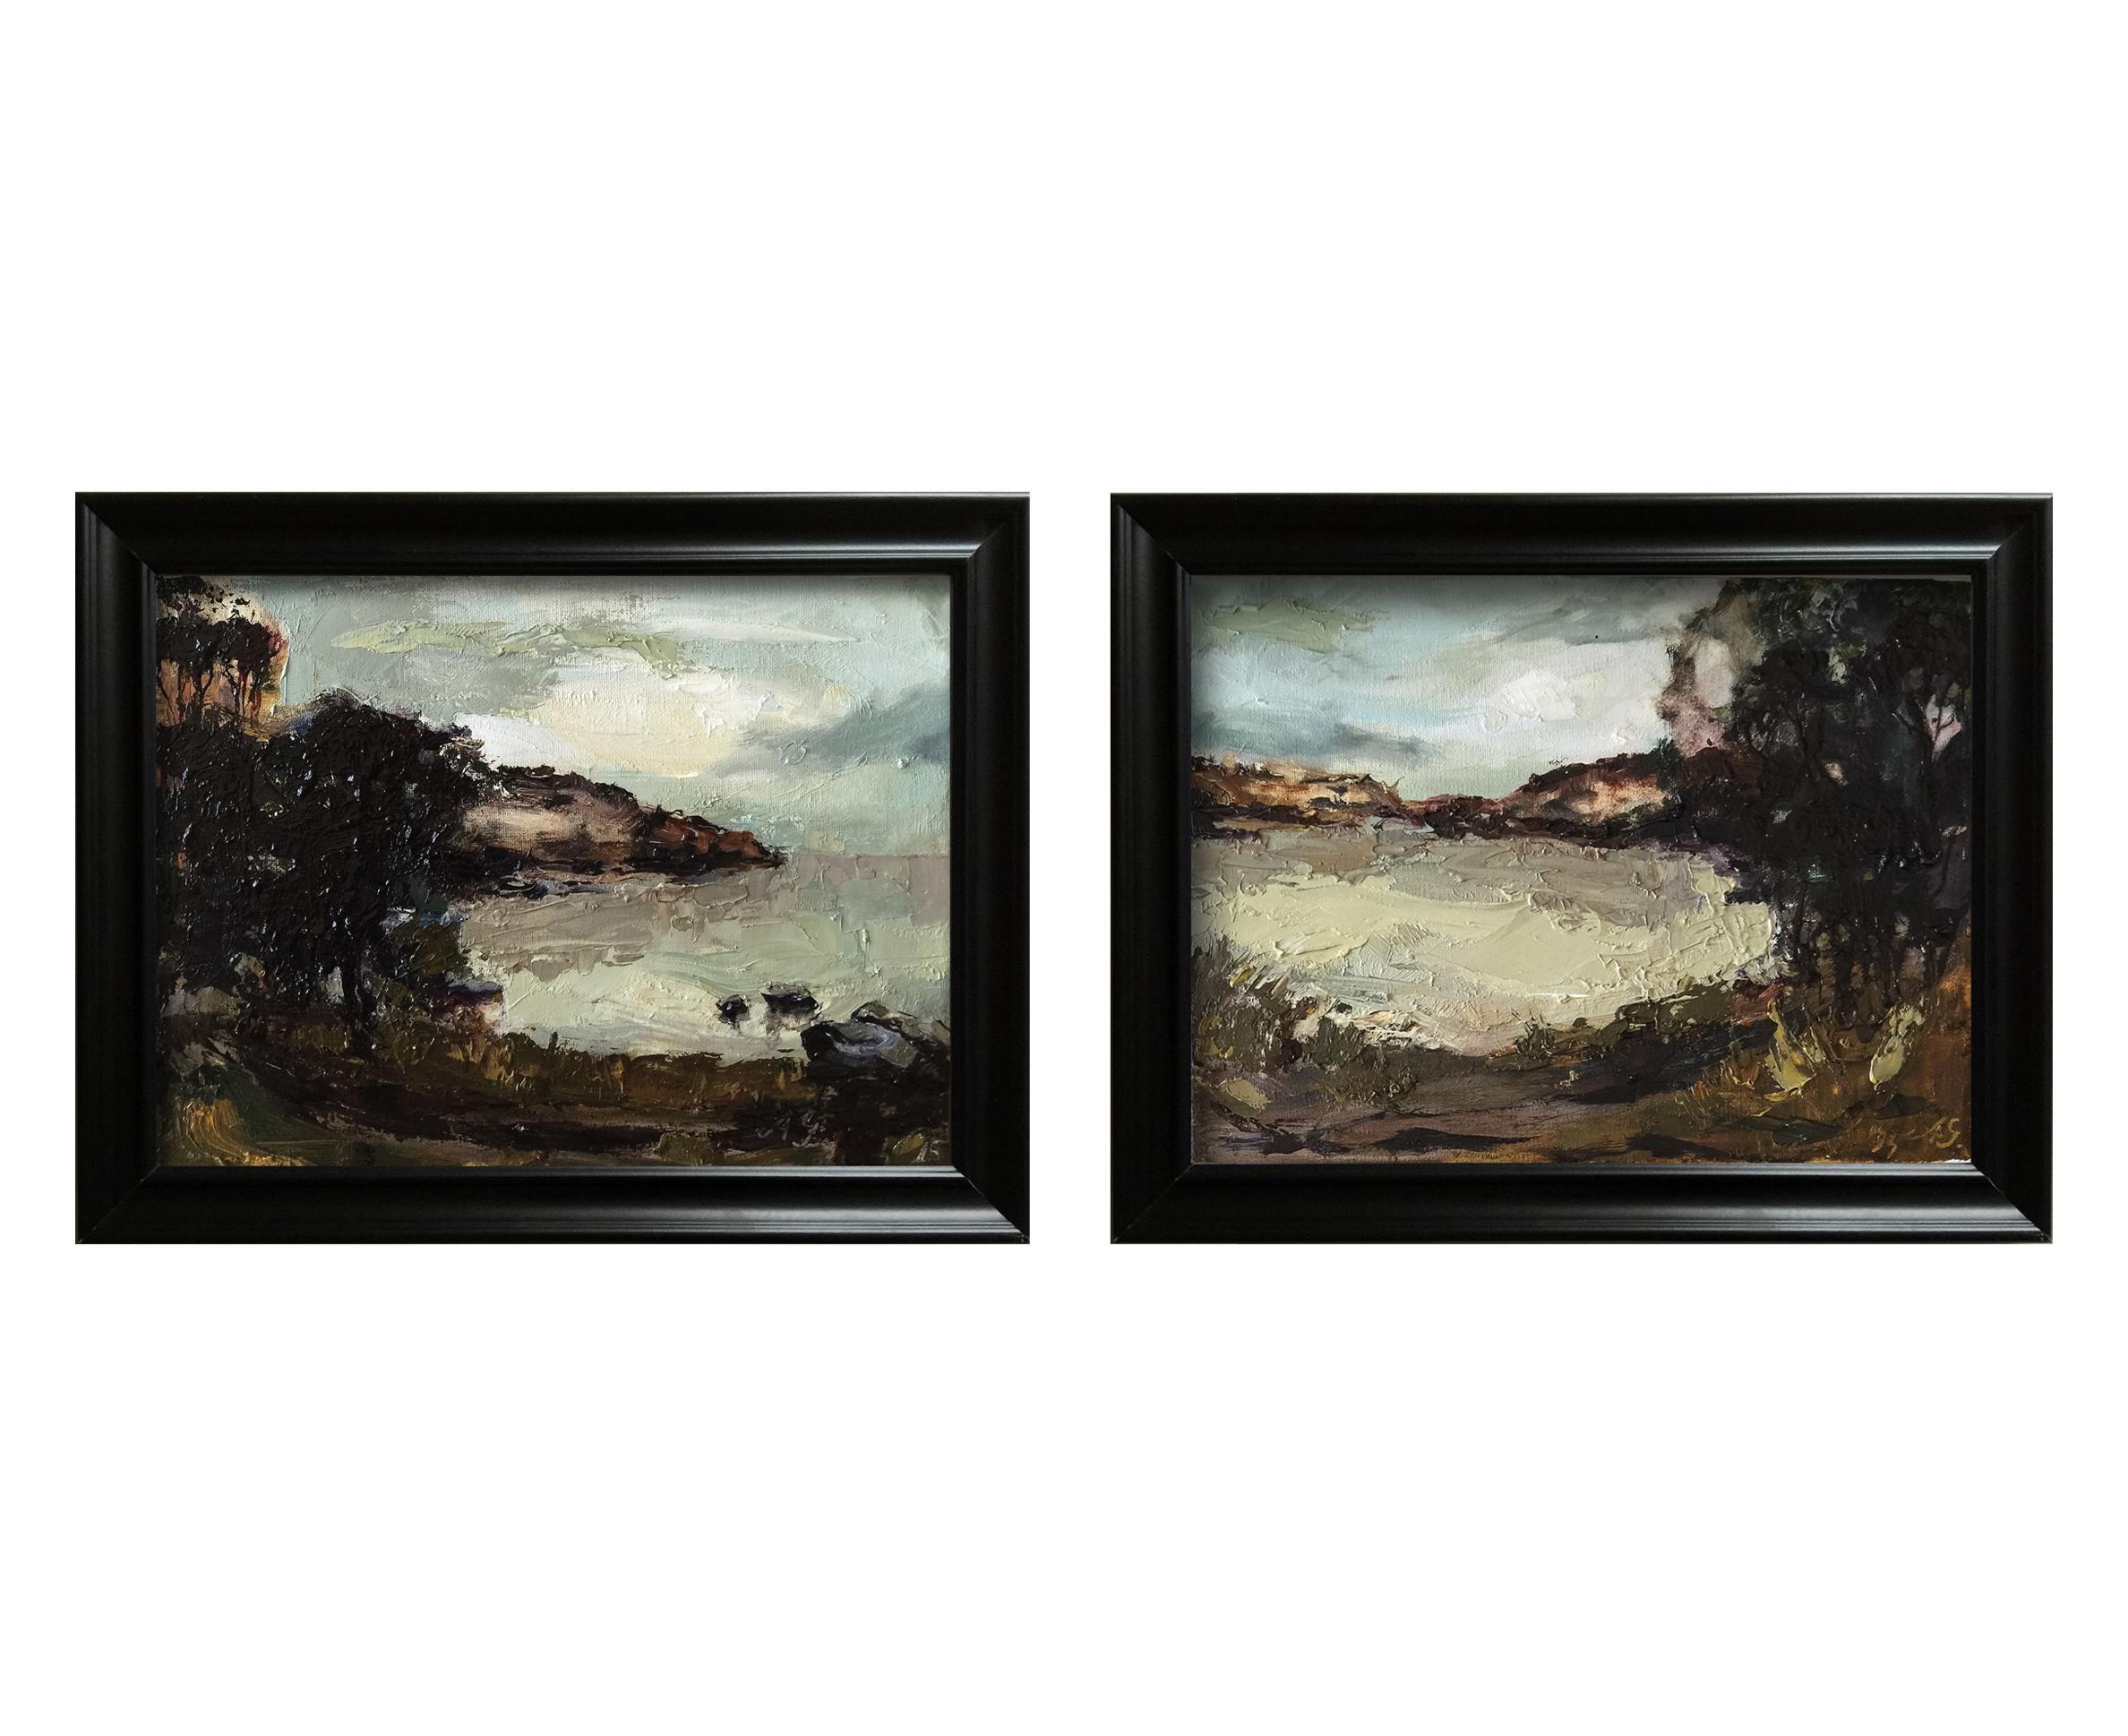 paintings_landscapes_13&14_border.jpg